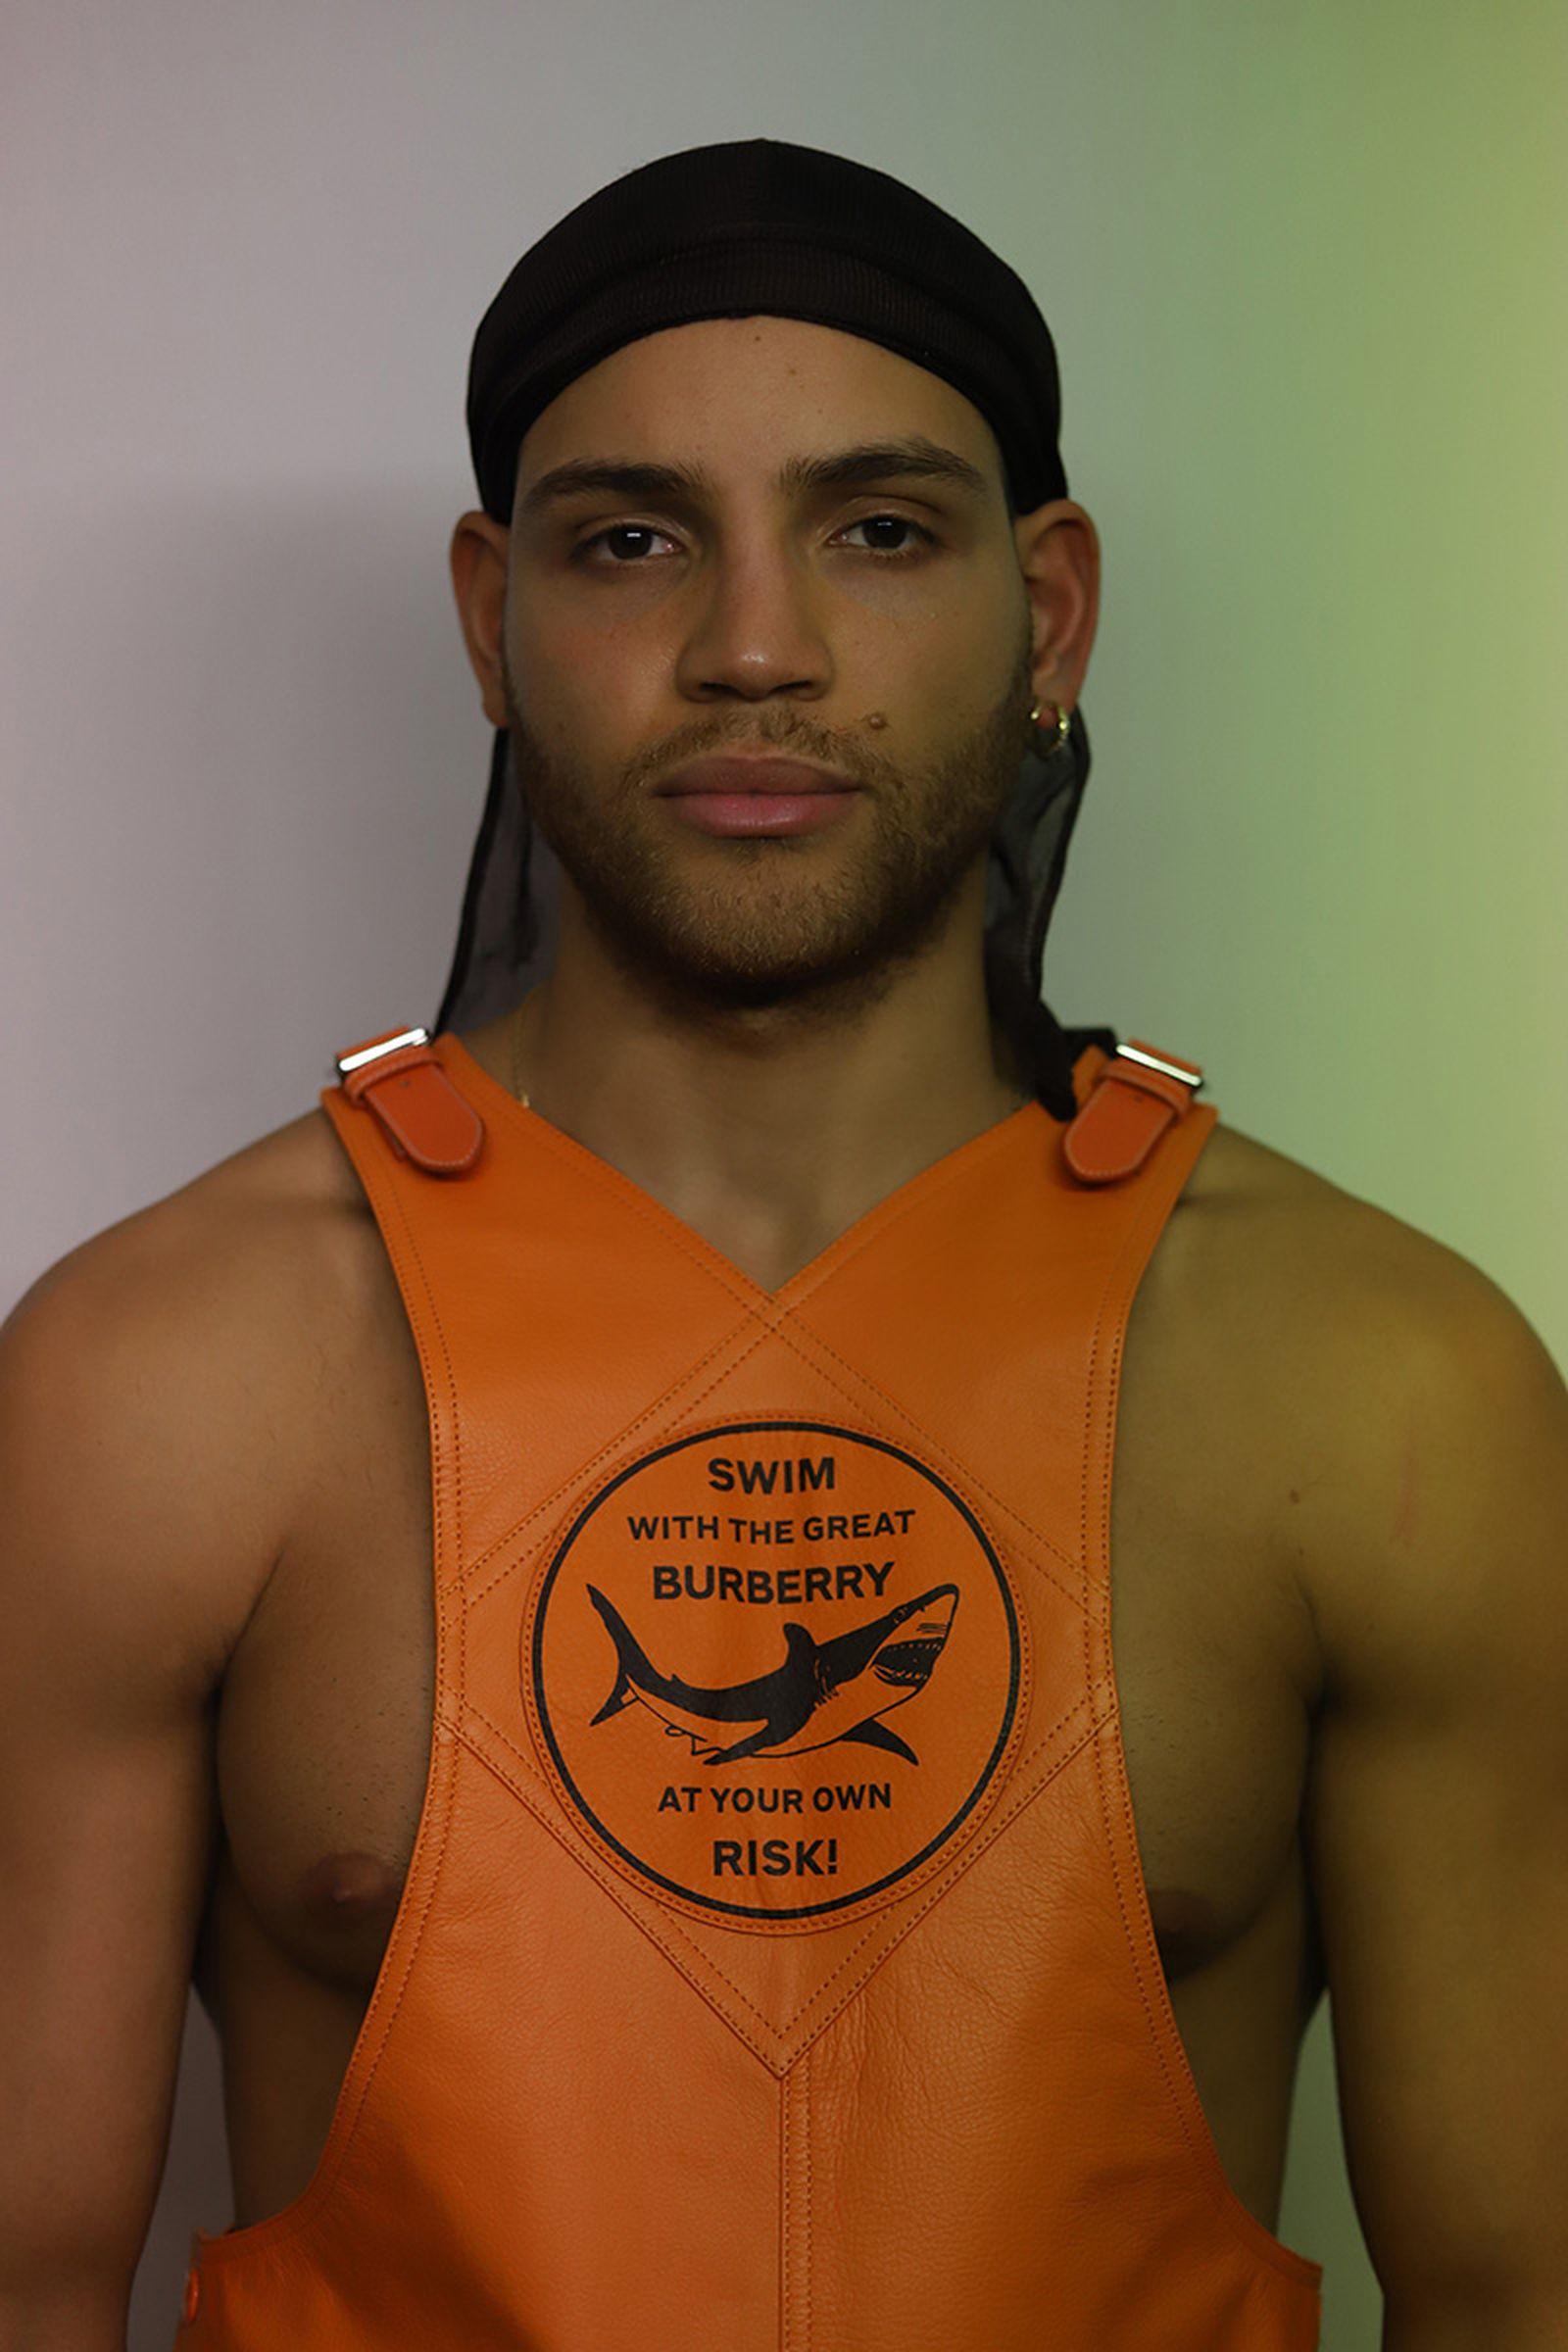 orange leather dungaree BURBERRY earing MARCO PANCONESI durag personal